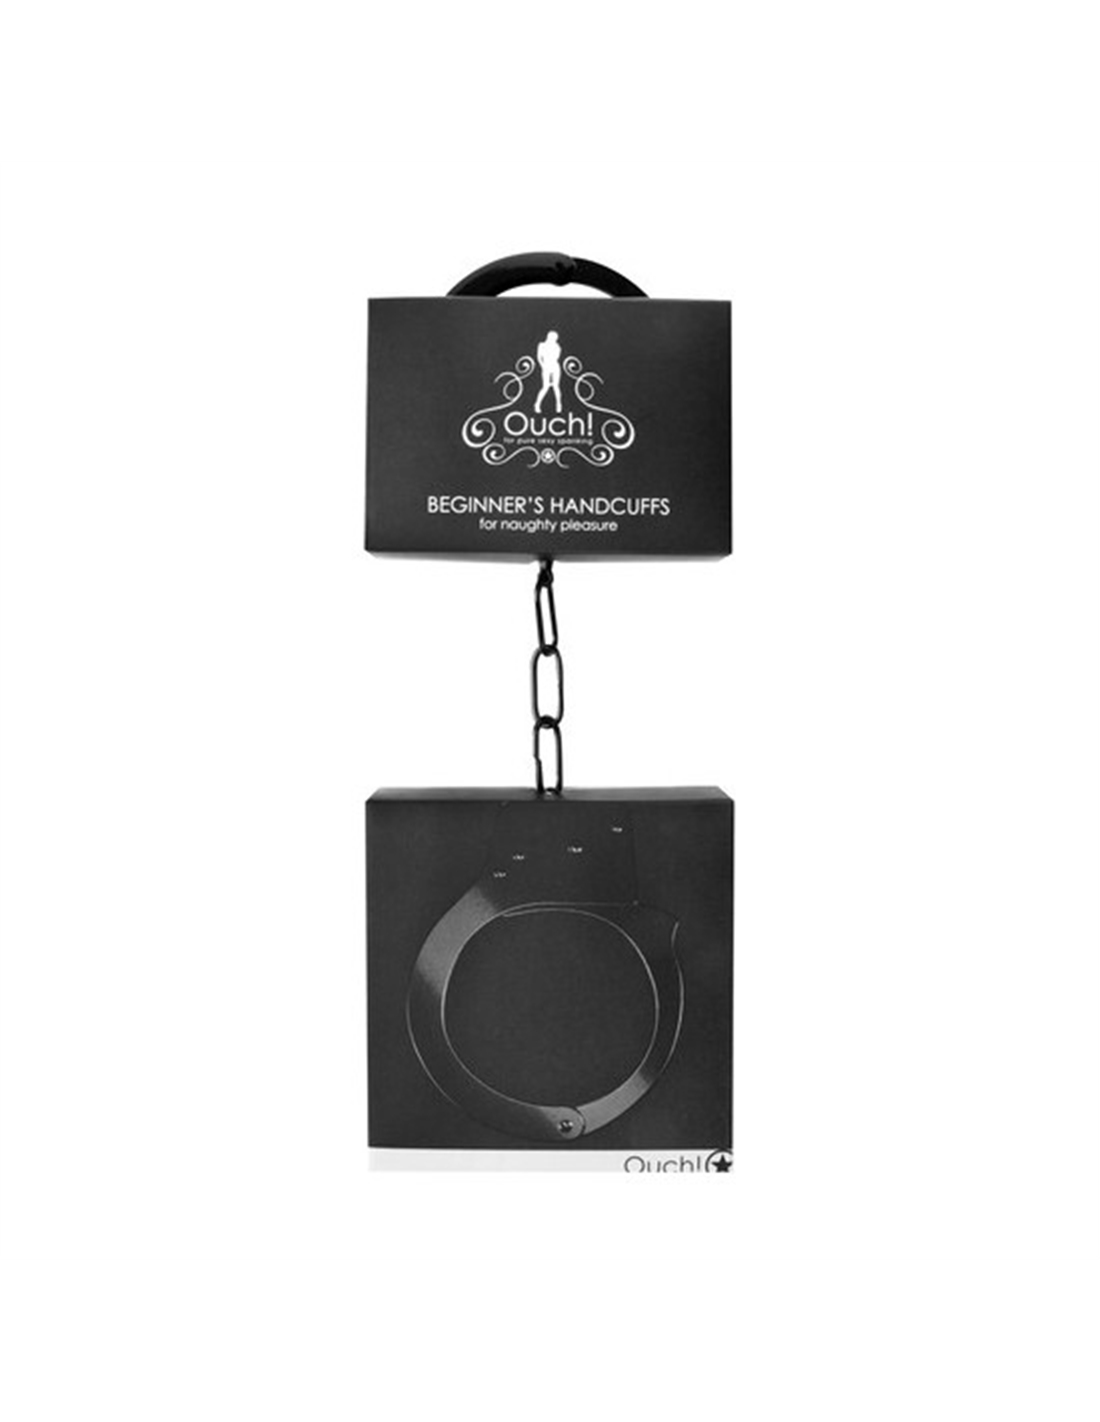 Algemas Em Metal Beginner's Handcuffs Pretas - PR2010320067